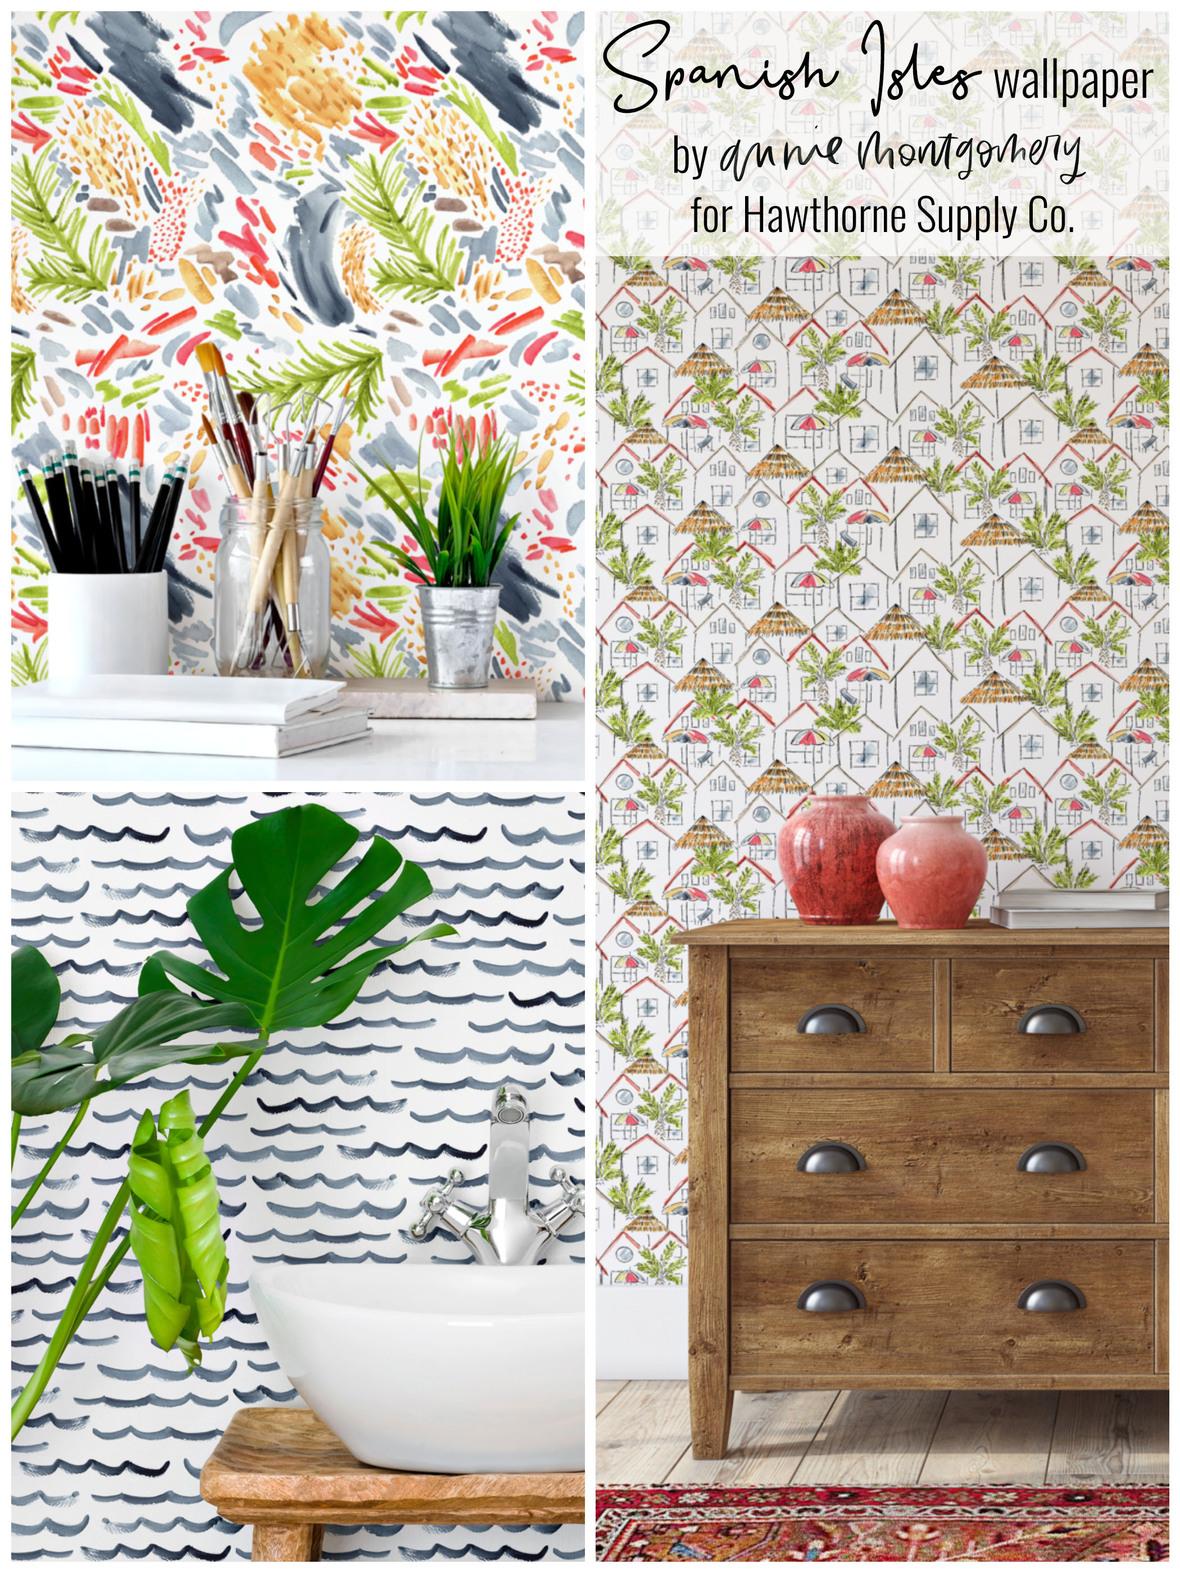 Spanish Isles wallpaper Annie Montgomery Hawthorne Supply Co